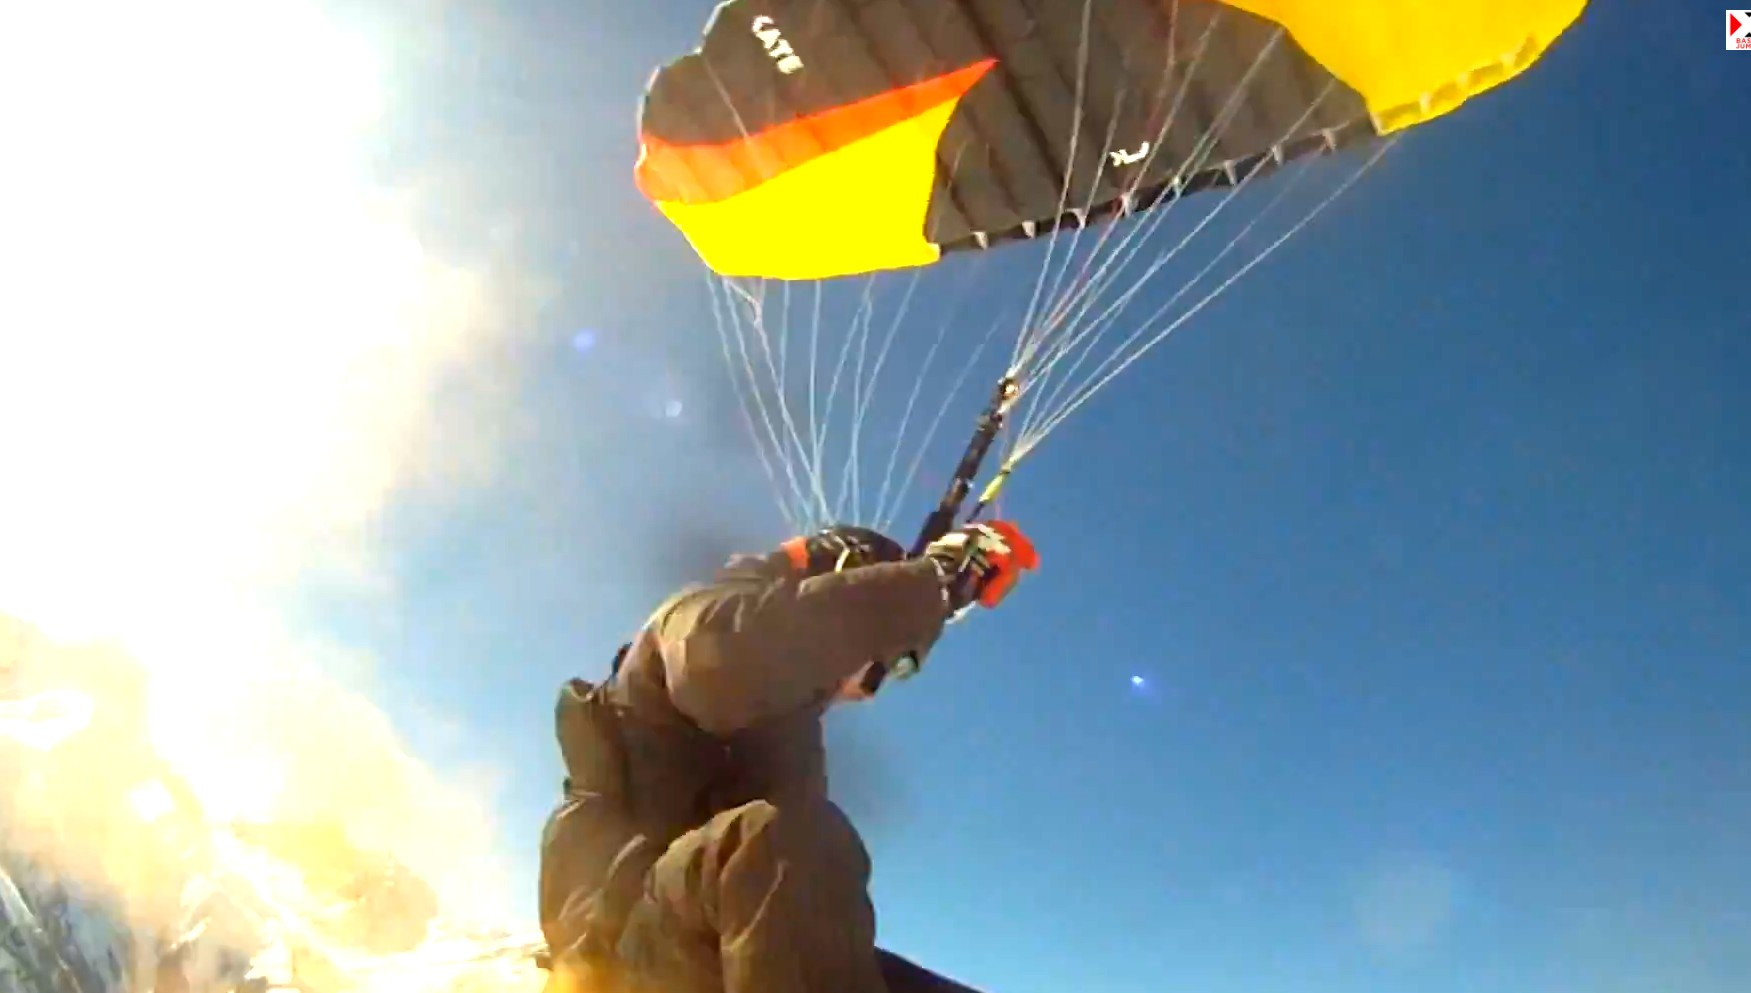 Speed riding sport extrême parachutisme